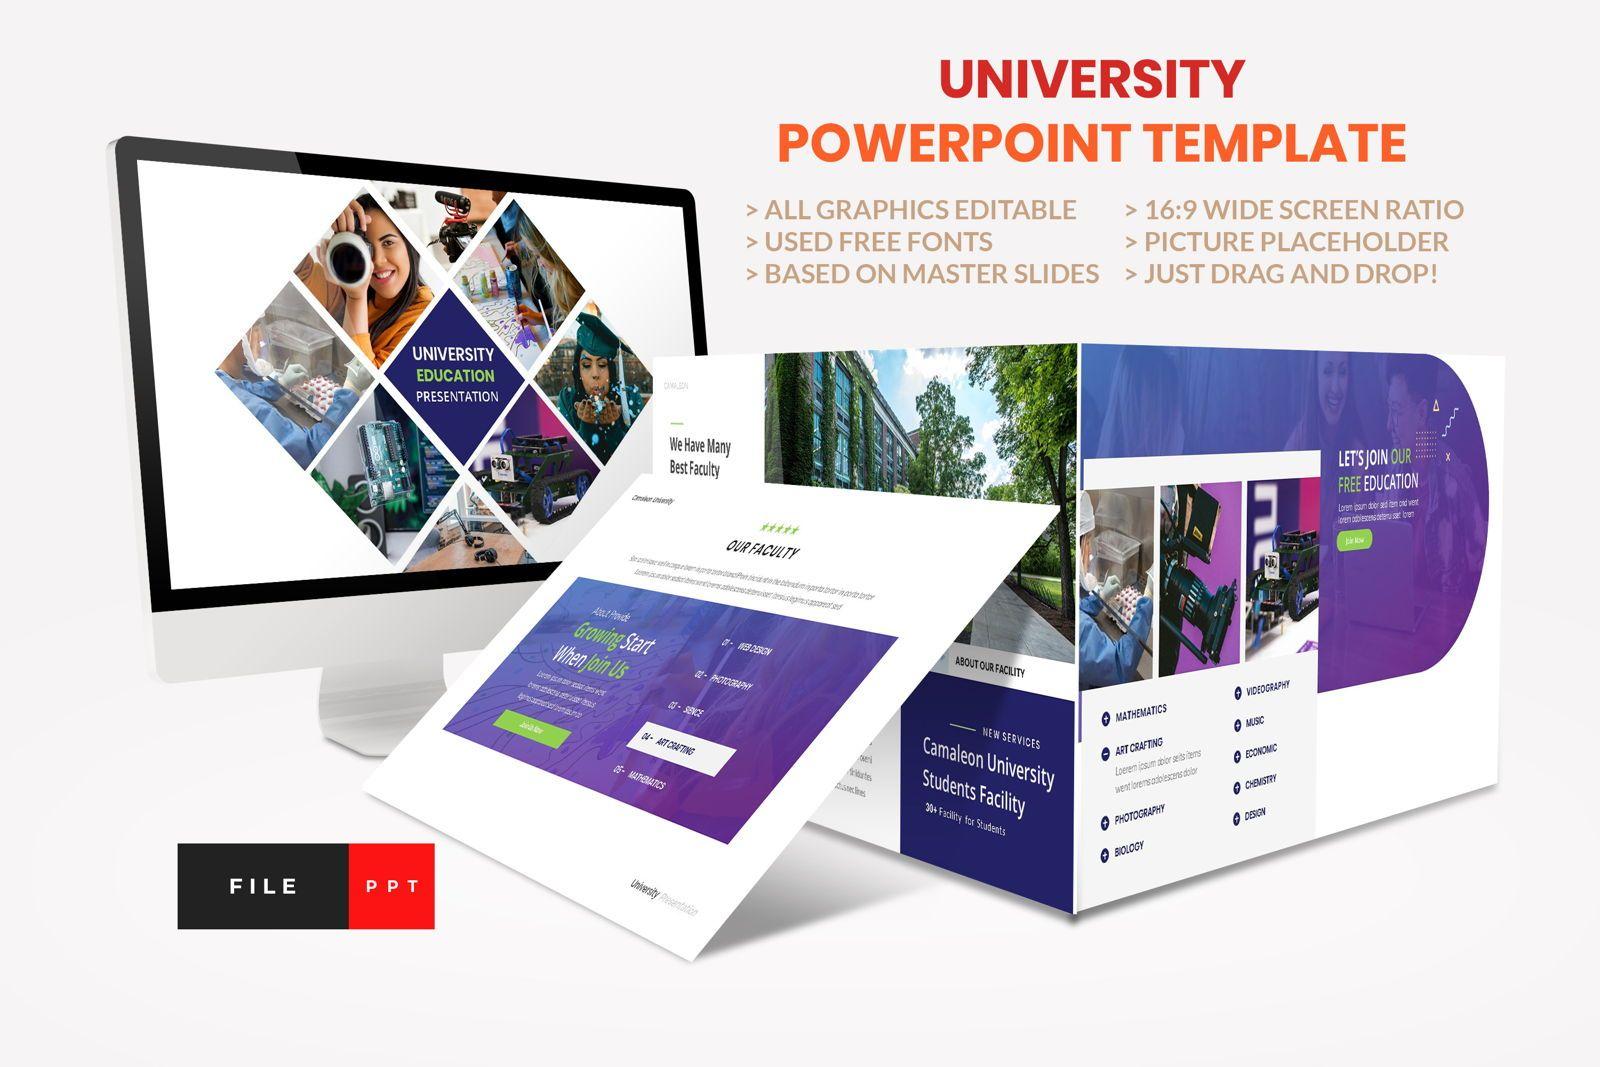 University - Education College Power Point Template, 08541, Presentation Templates — PoweredTemplate.com